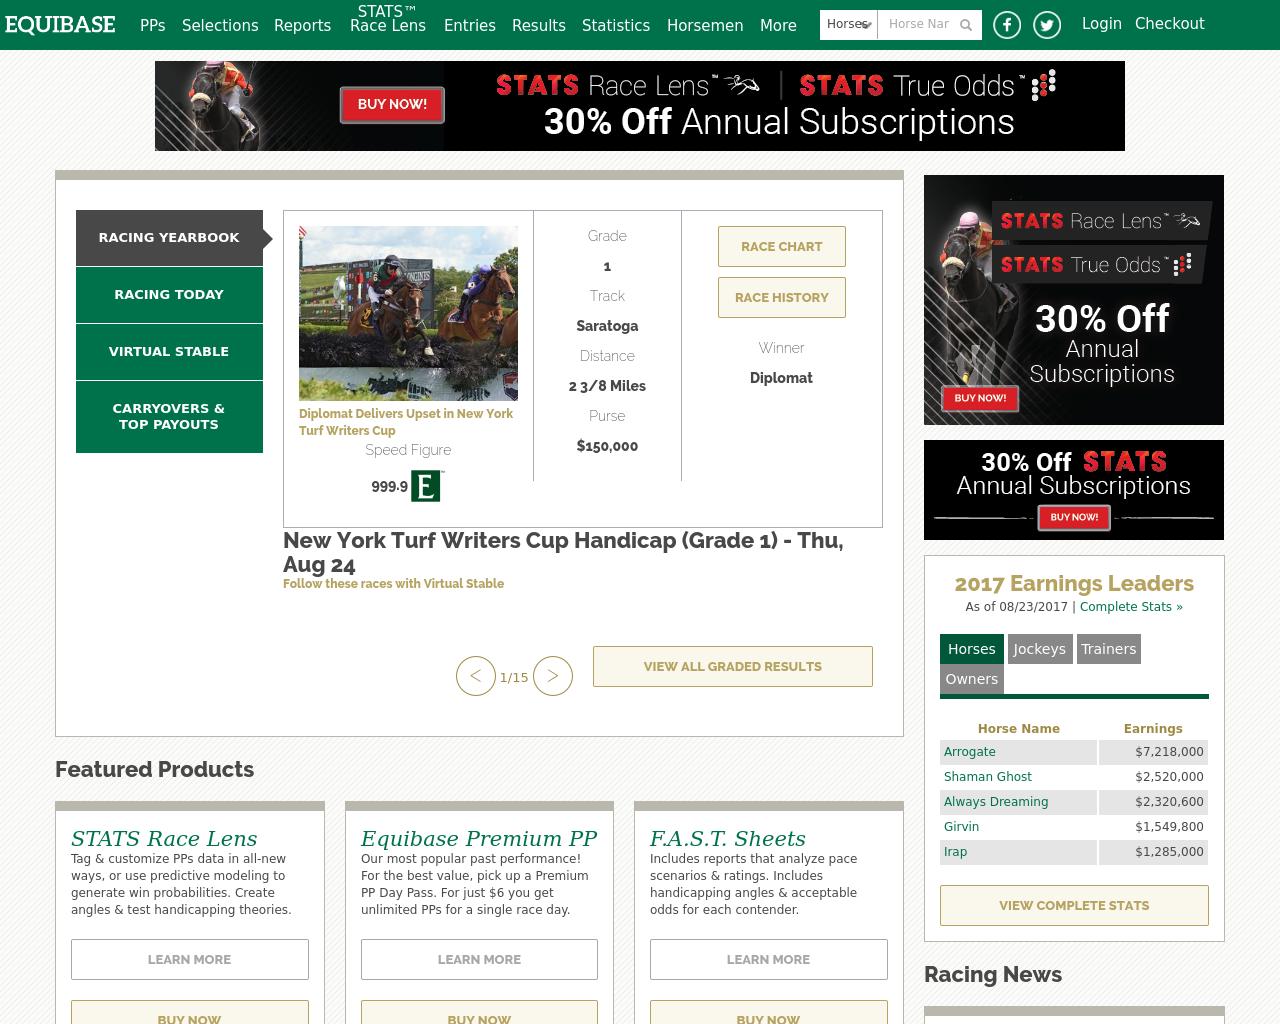 Equibase-Company-Advertising-Reviews-Pricing